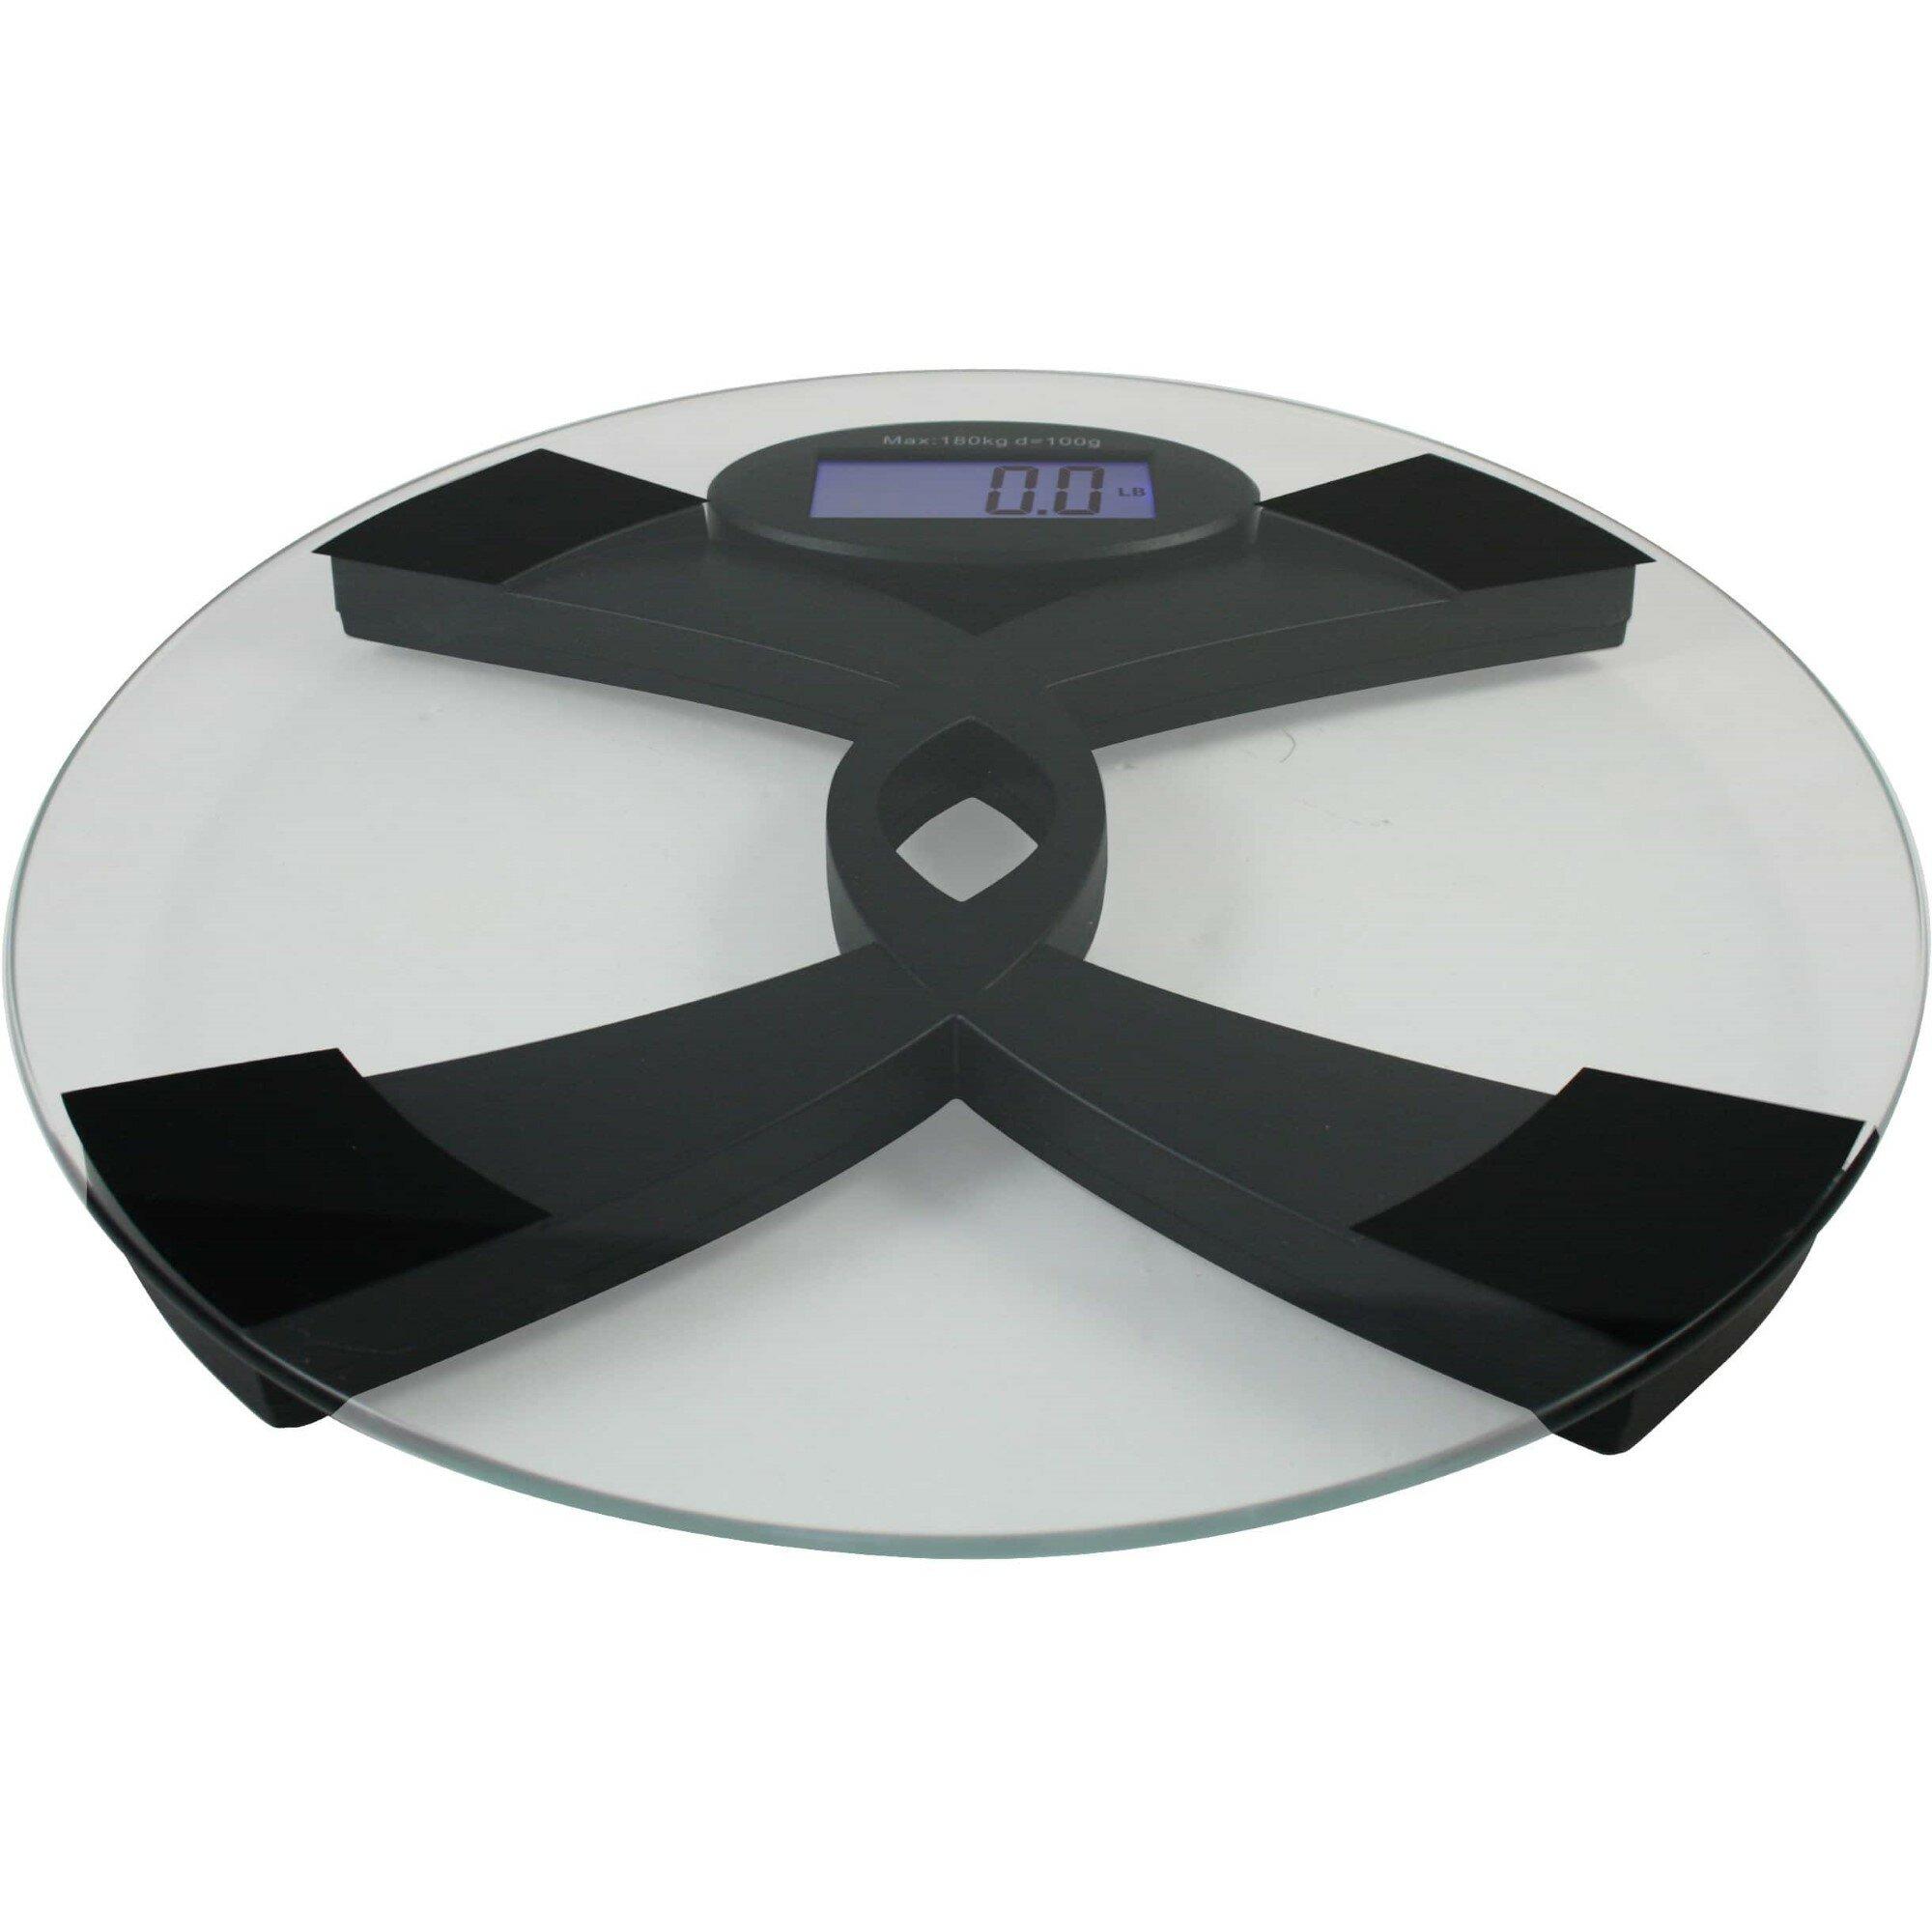 American Weigh Scales Talking Bathroom